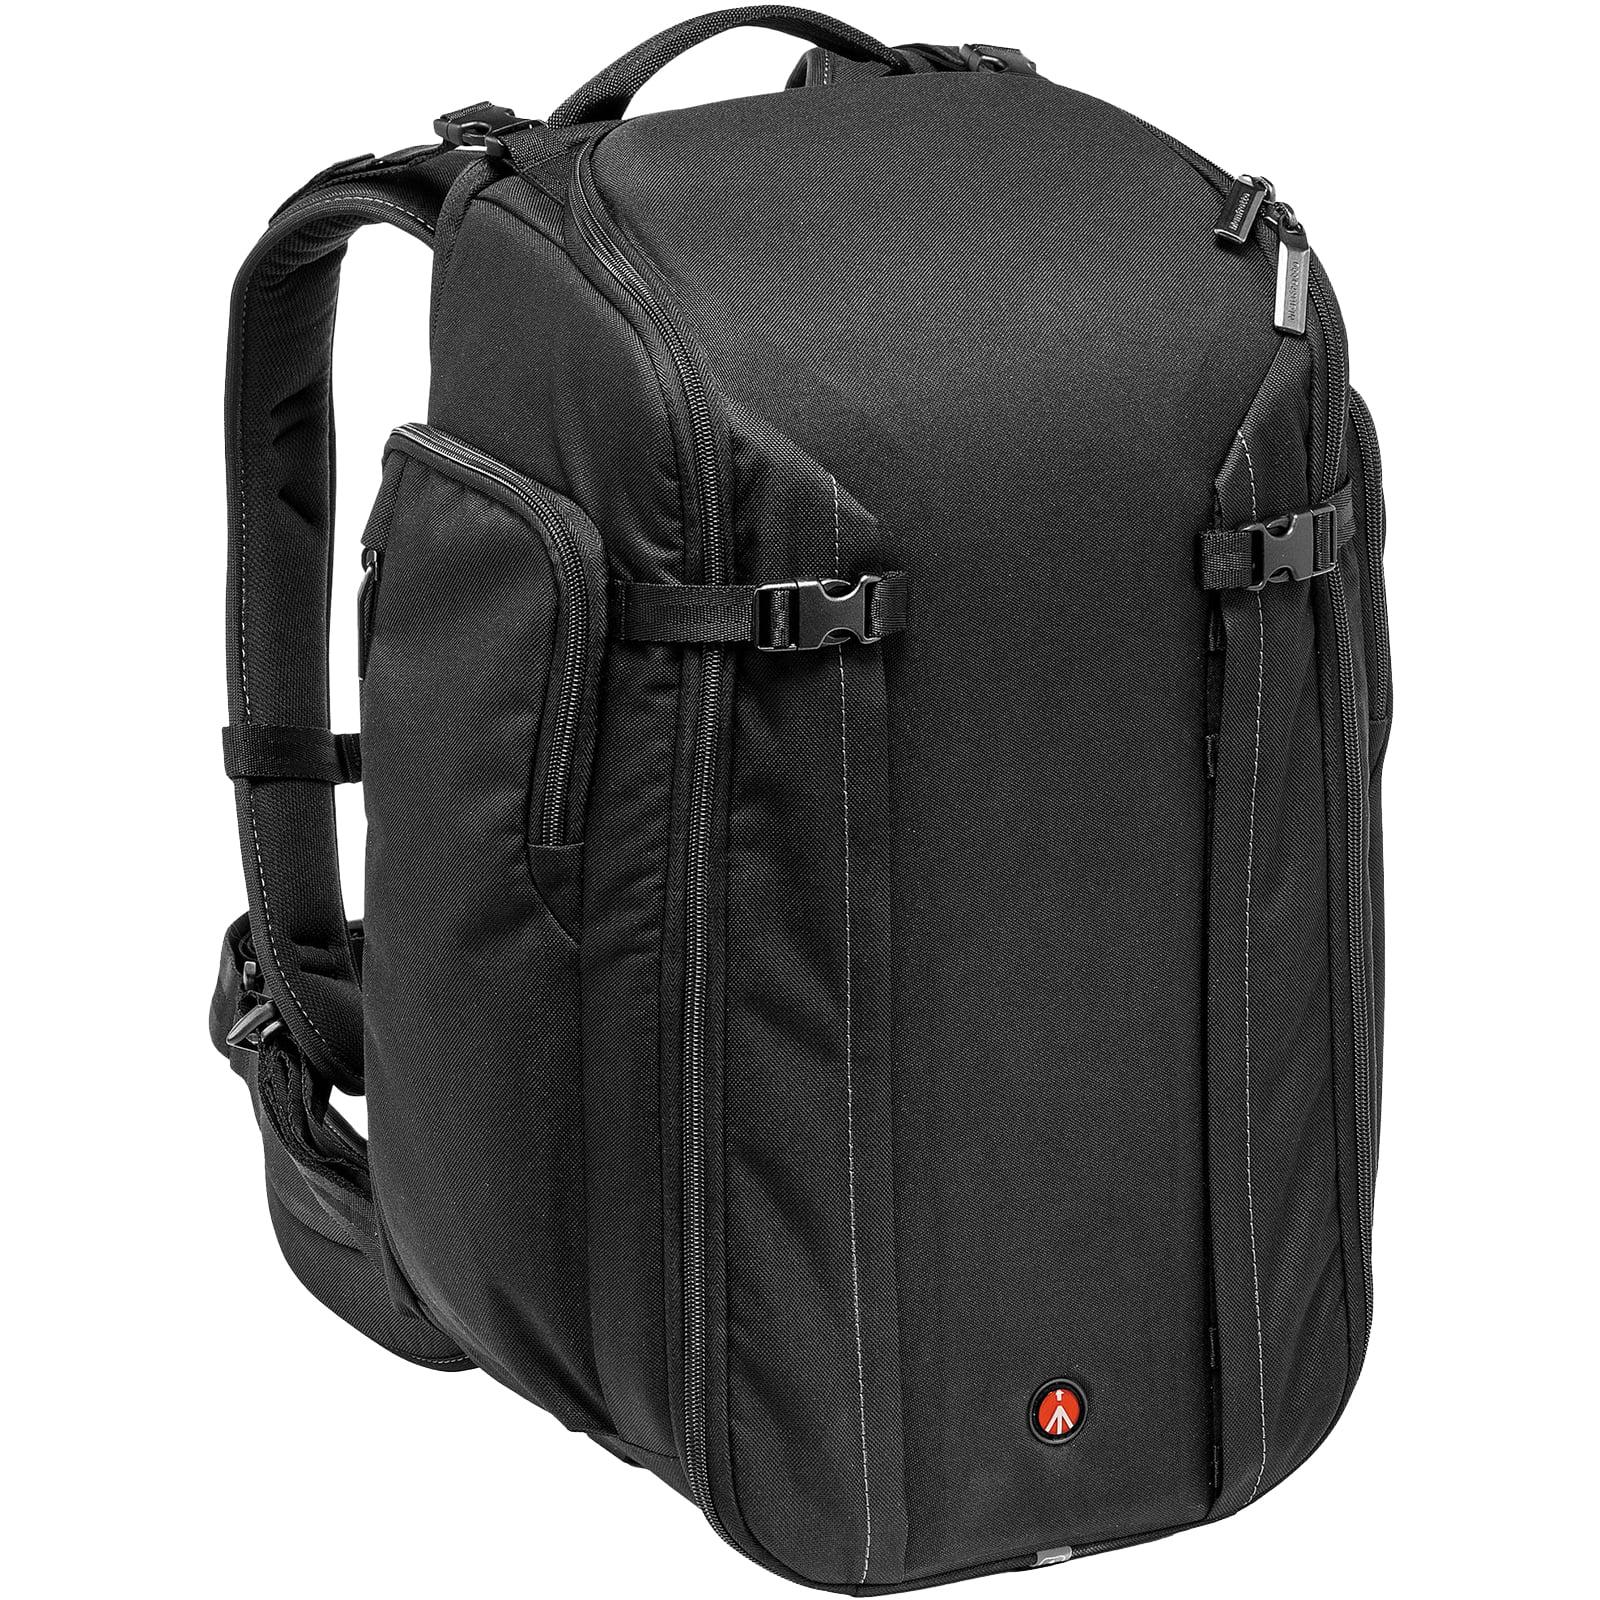 MANFROTTO Pro 50 Digital SLR Camera Backpack